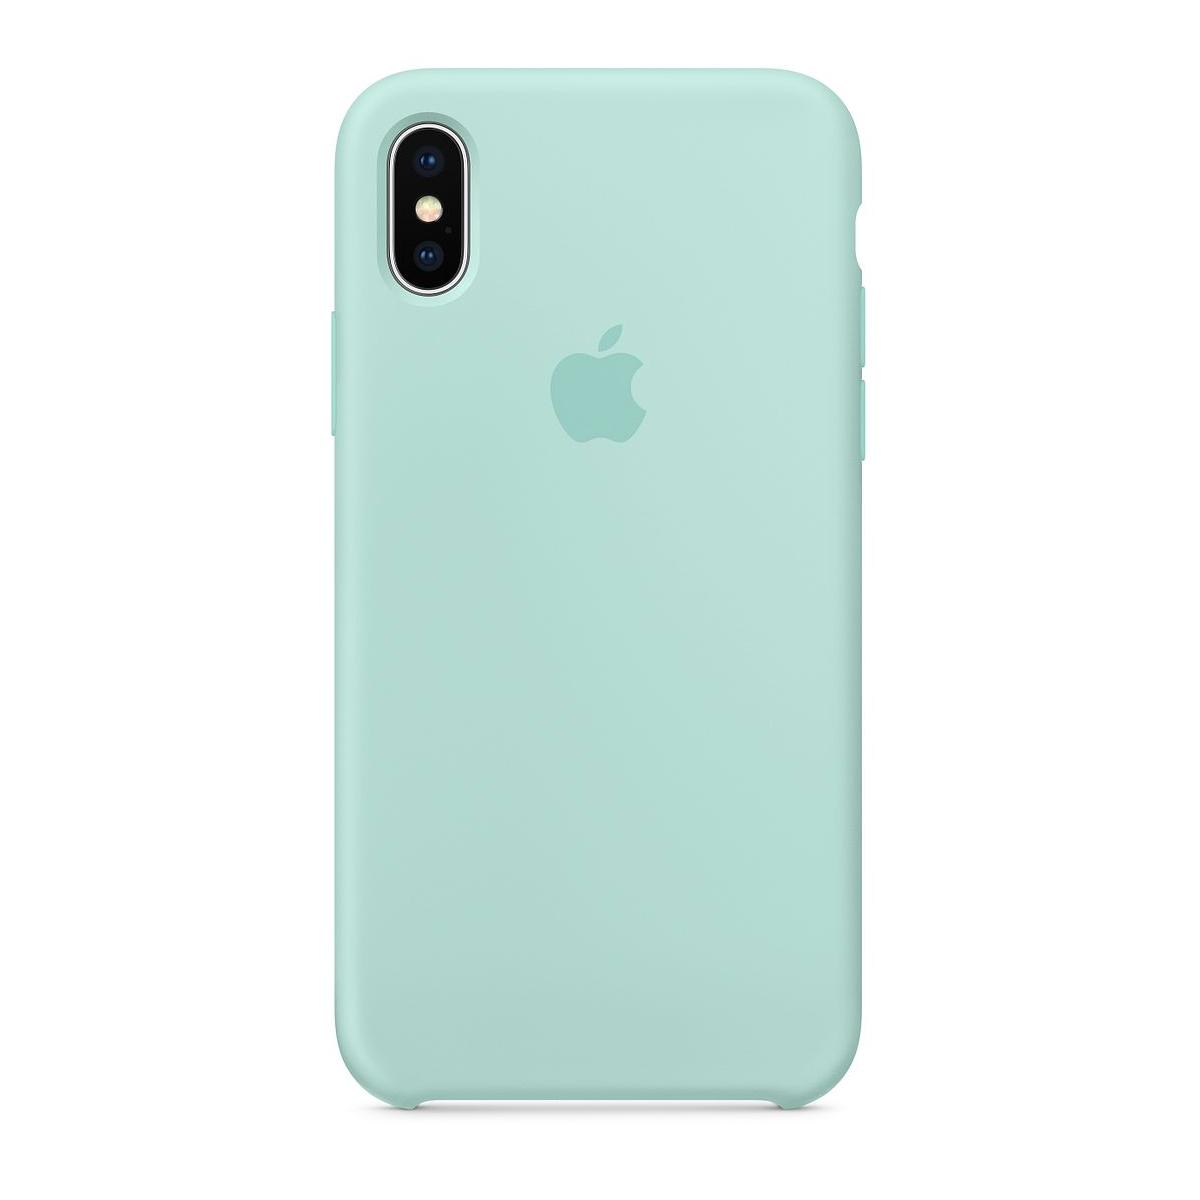 new style 81b3f 4590f Силиконовый чехол Apple Silicone Case Marine Green (1:1) для iPhone XS Max:  продажа, цена в Харькове. ...